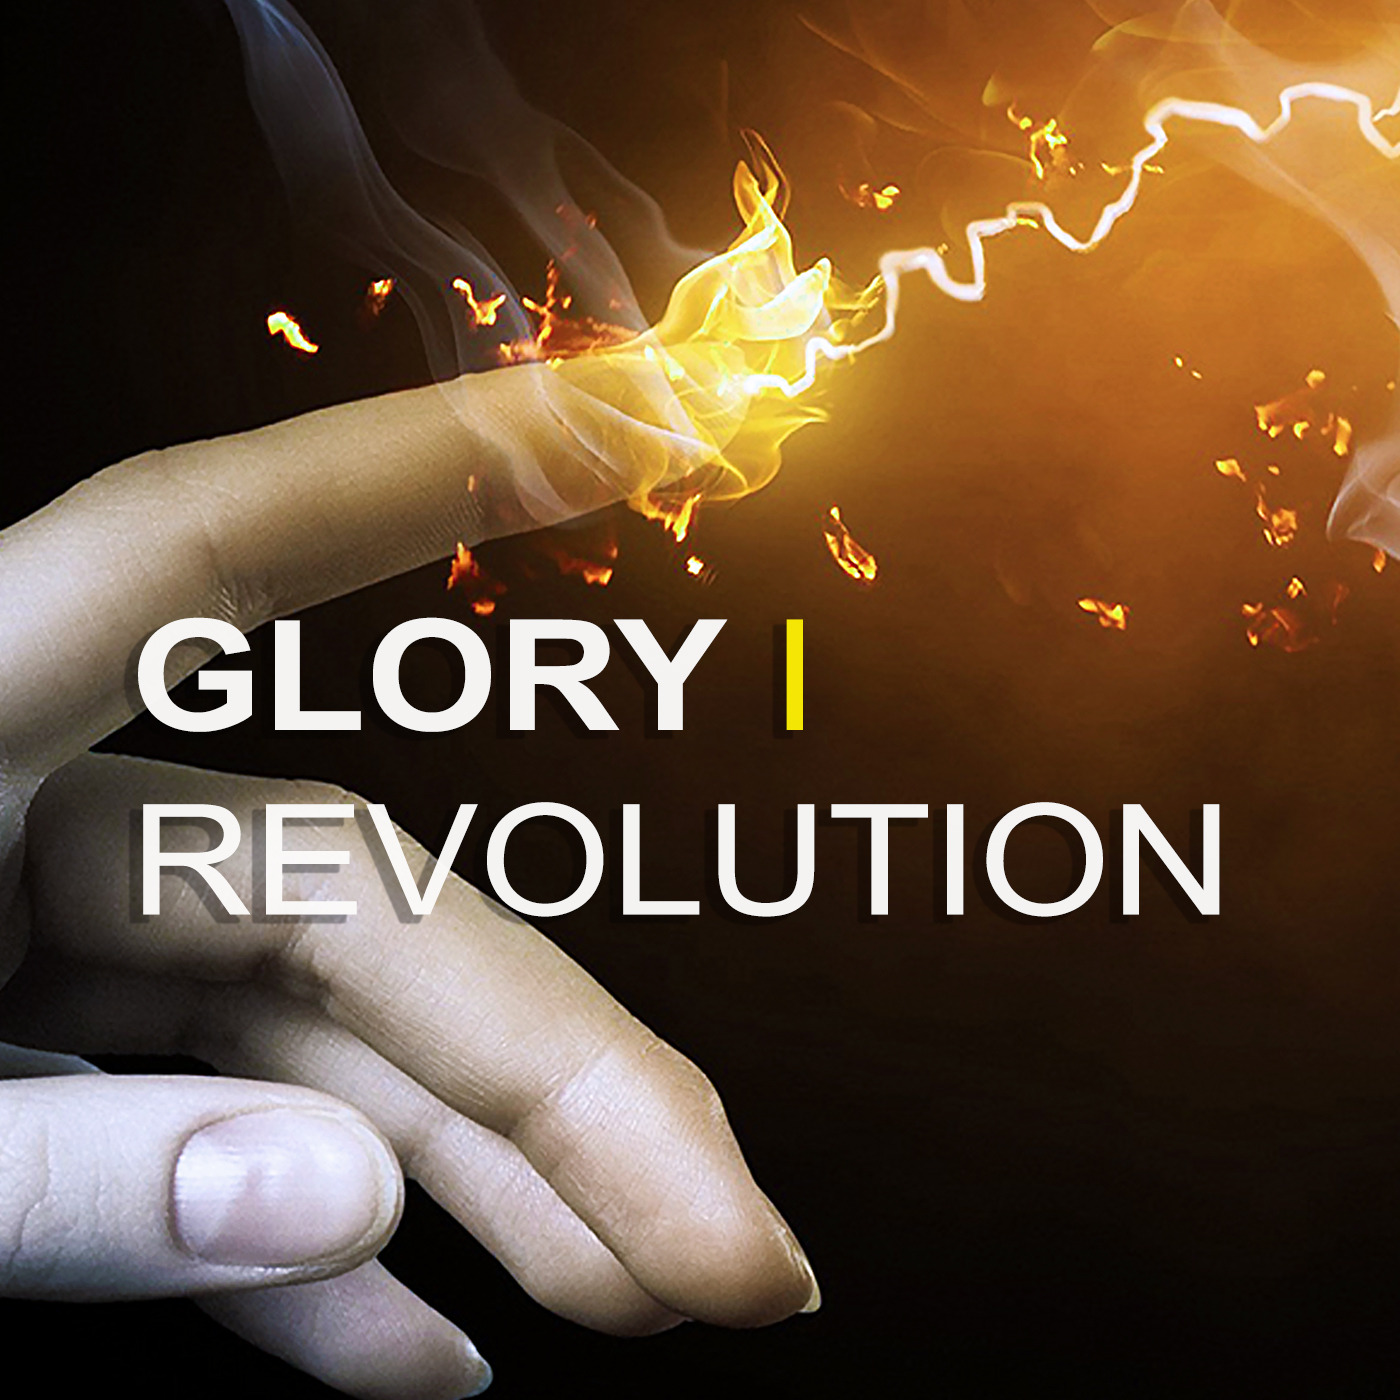 Glory Revolution